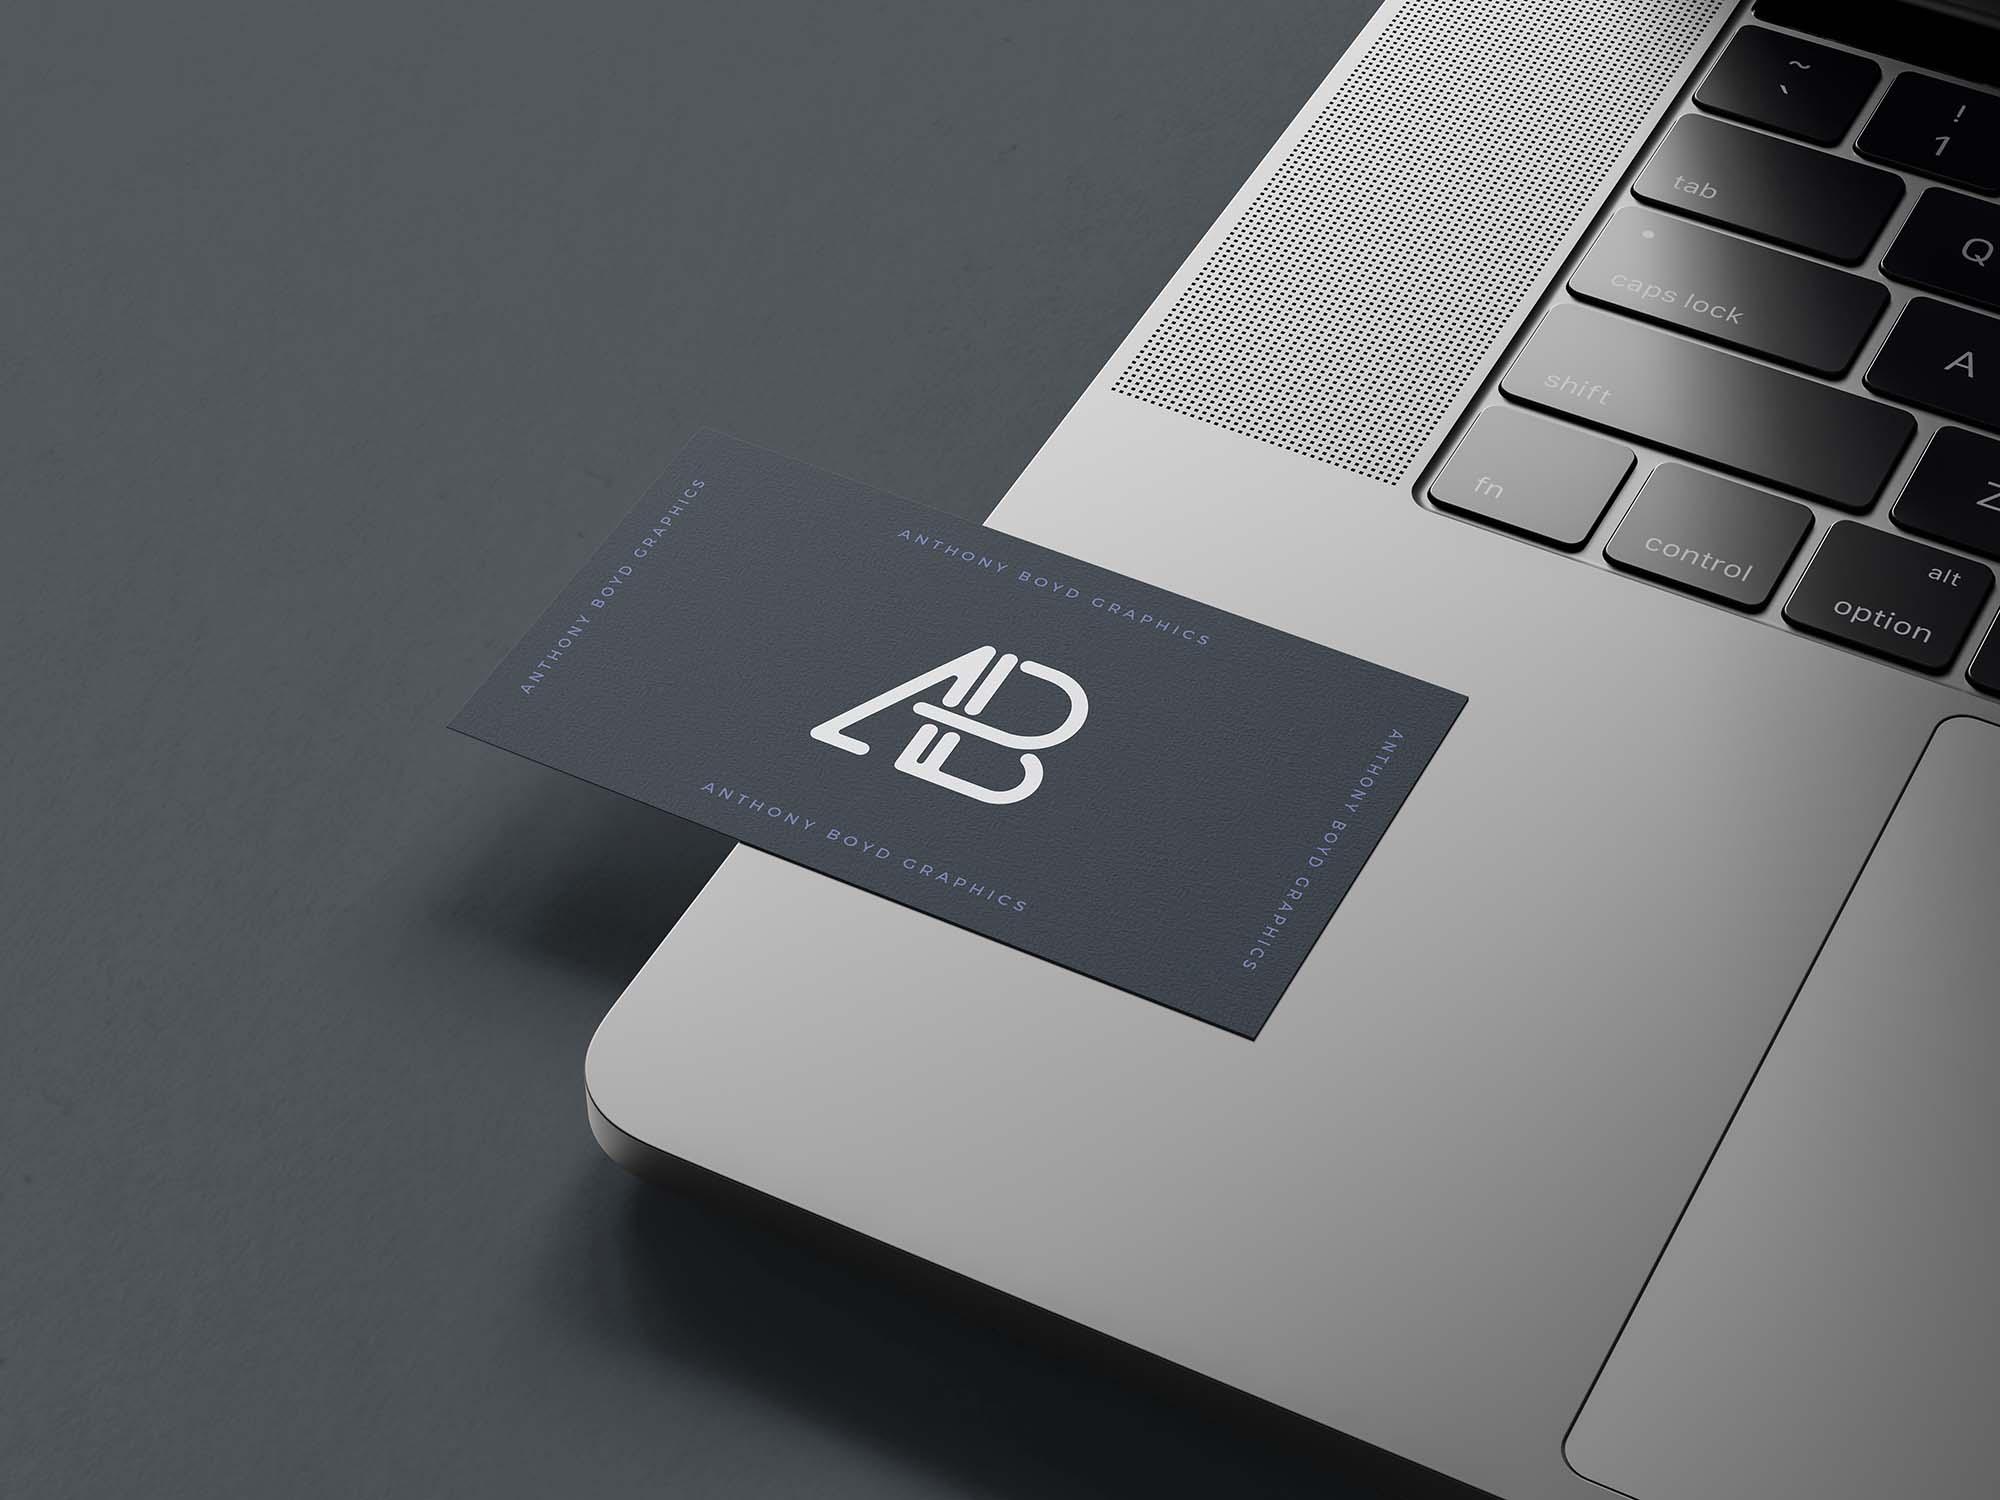 Business Card on MacBook Pro Mockup 2